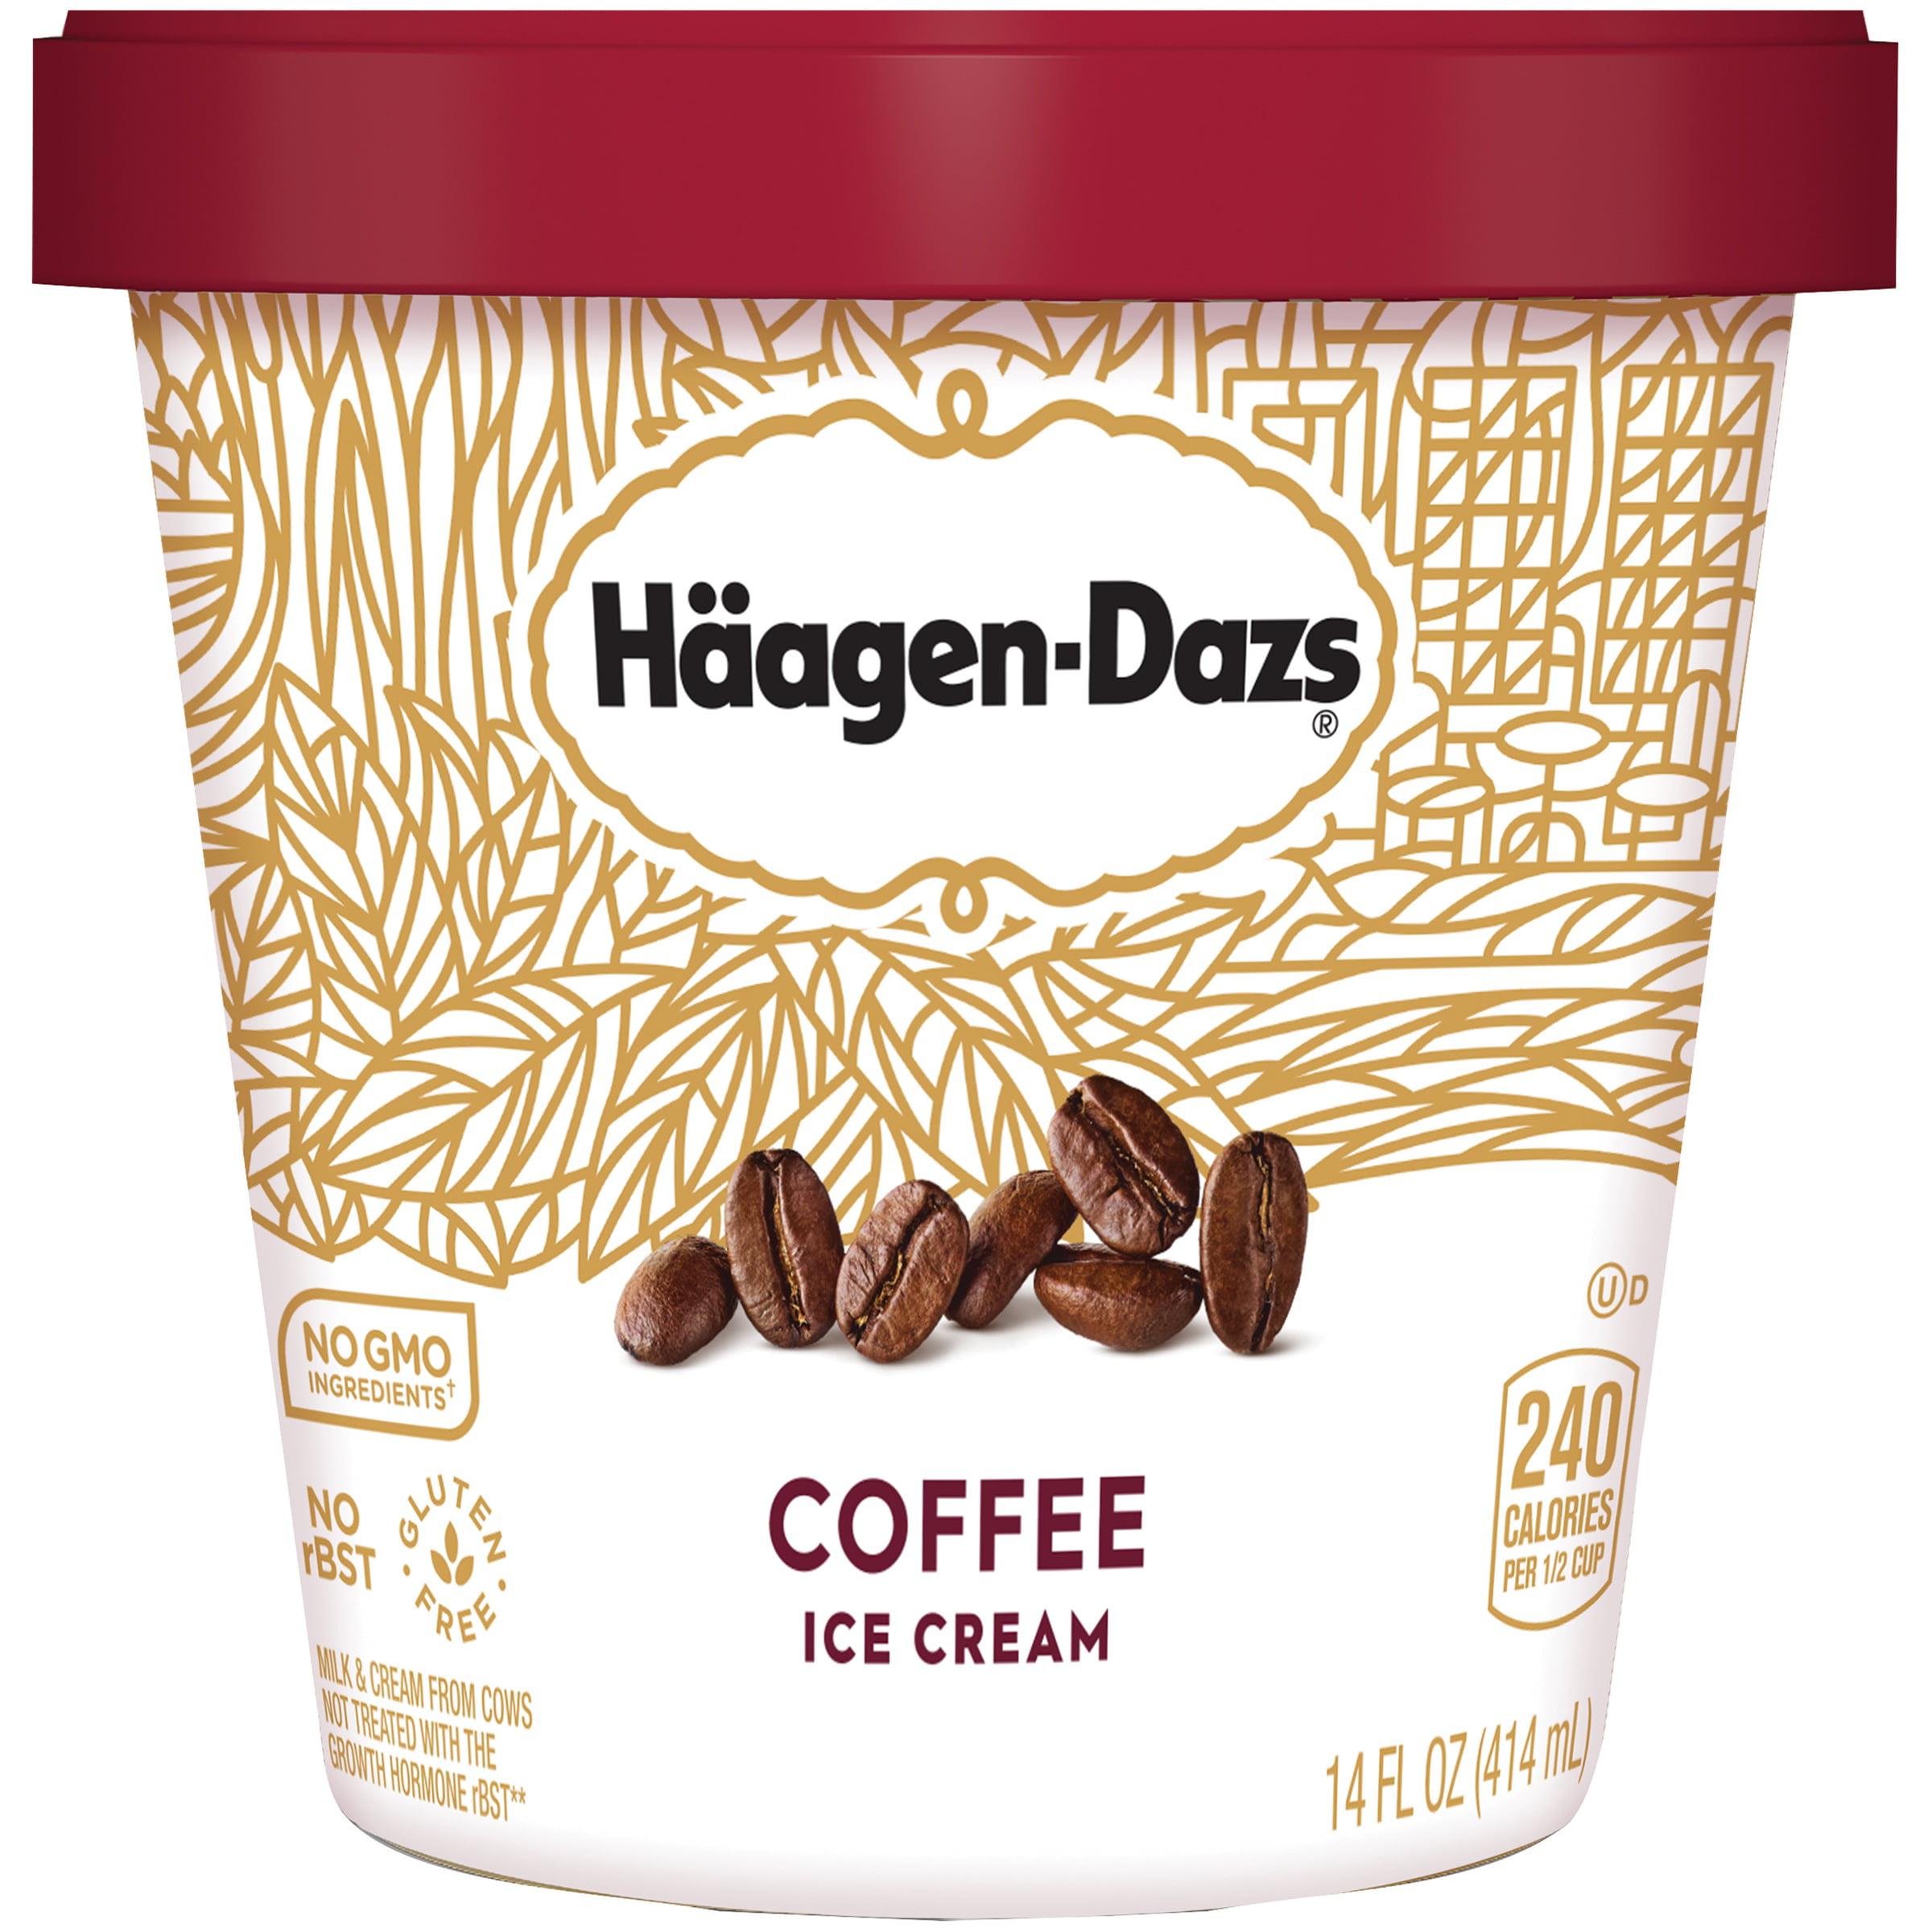 HAAGEN-DAZS Coffee Ice Cream 14 fl. oz. Cup - Walmart.com